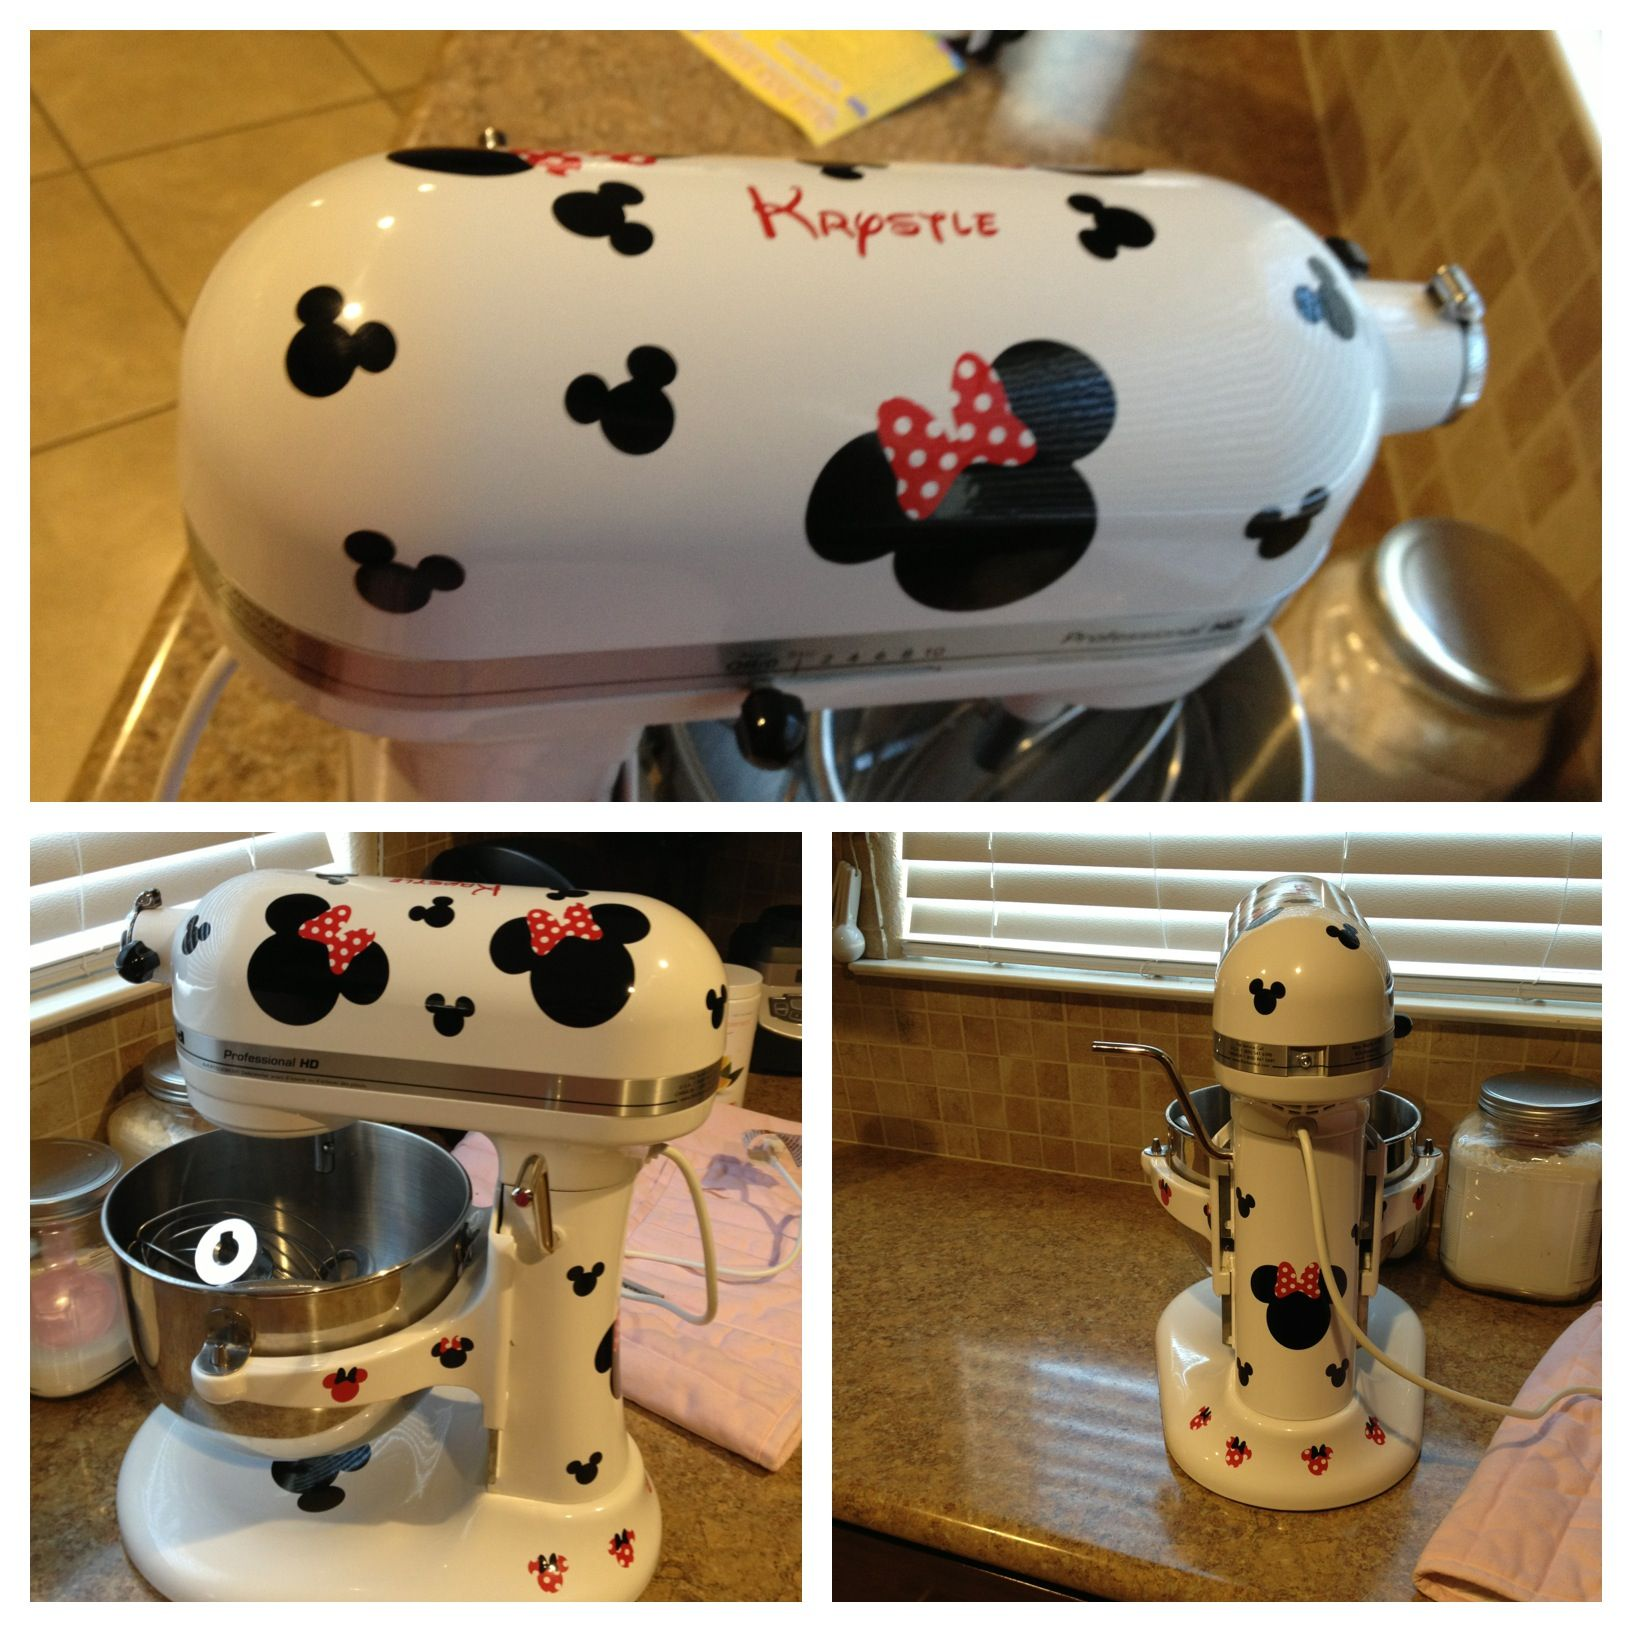 Disney Kitchen Items: Custom Minnie And Mickey Mouse Kitchenaid Mixer!